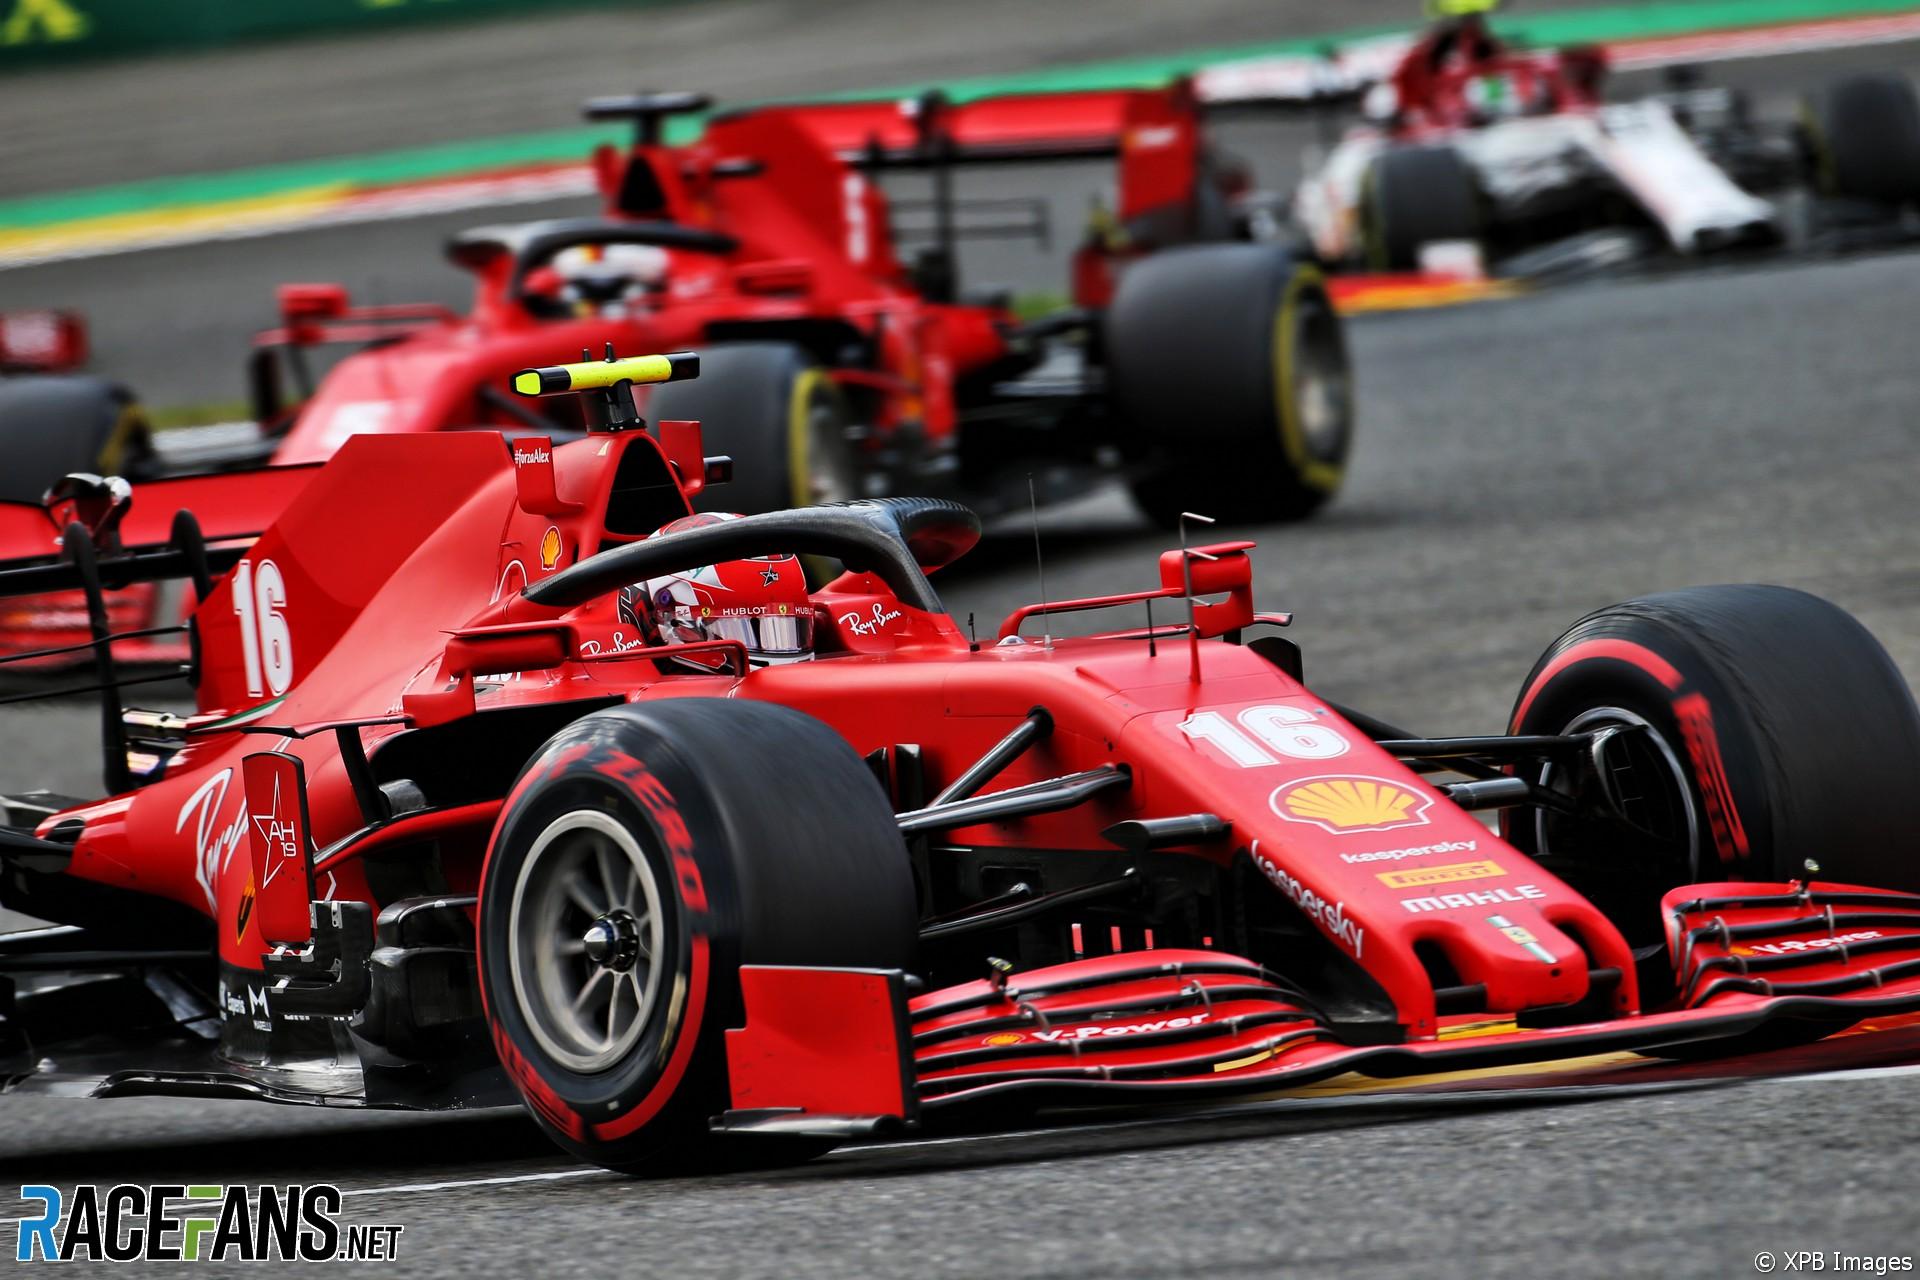 Charles Leclerc, Ferrari, Spa-Francorchamps, 2020